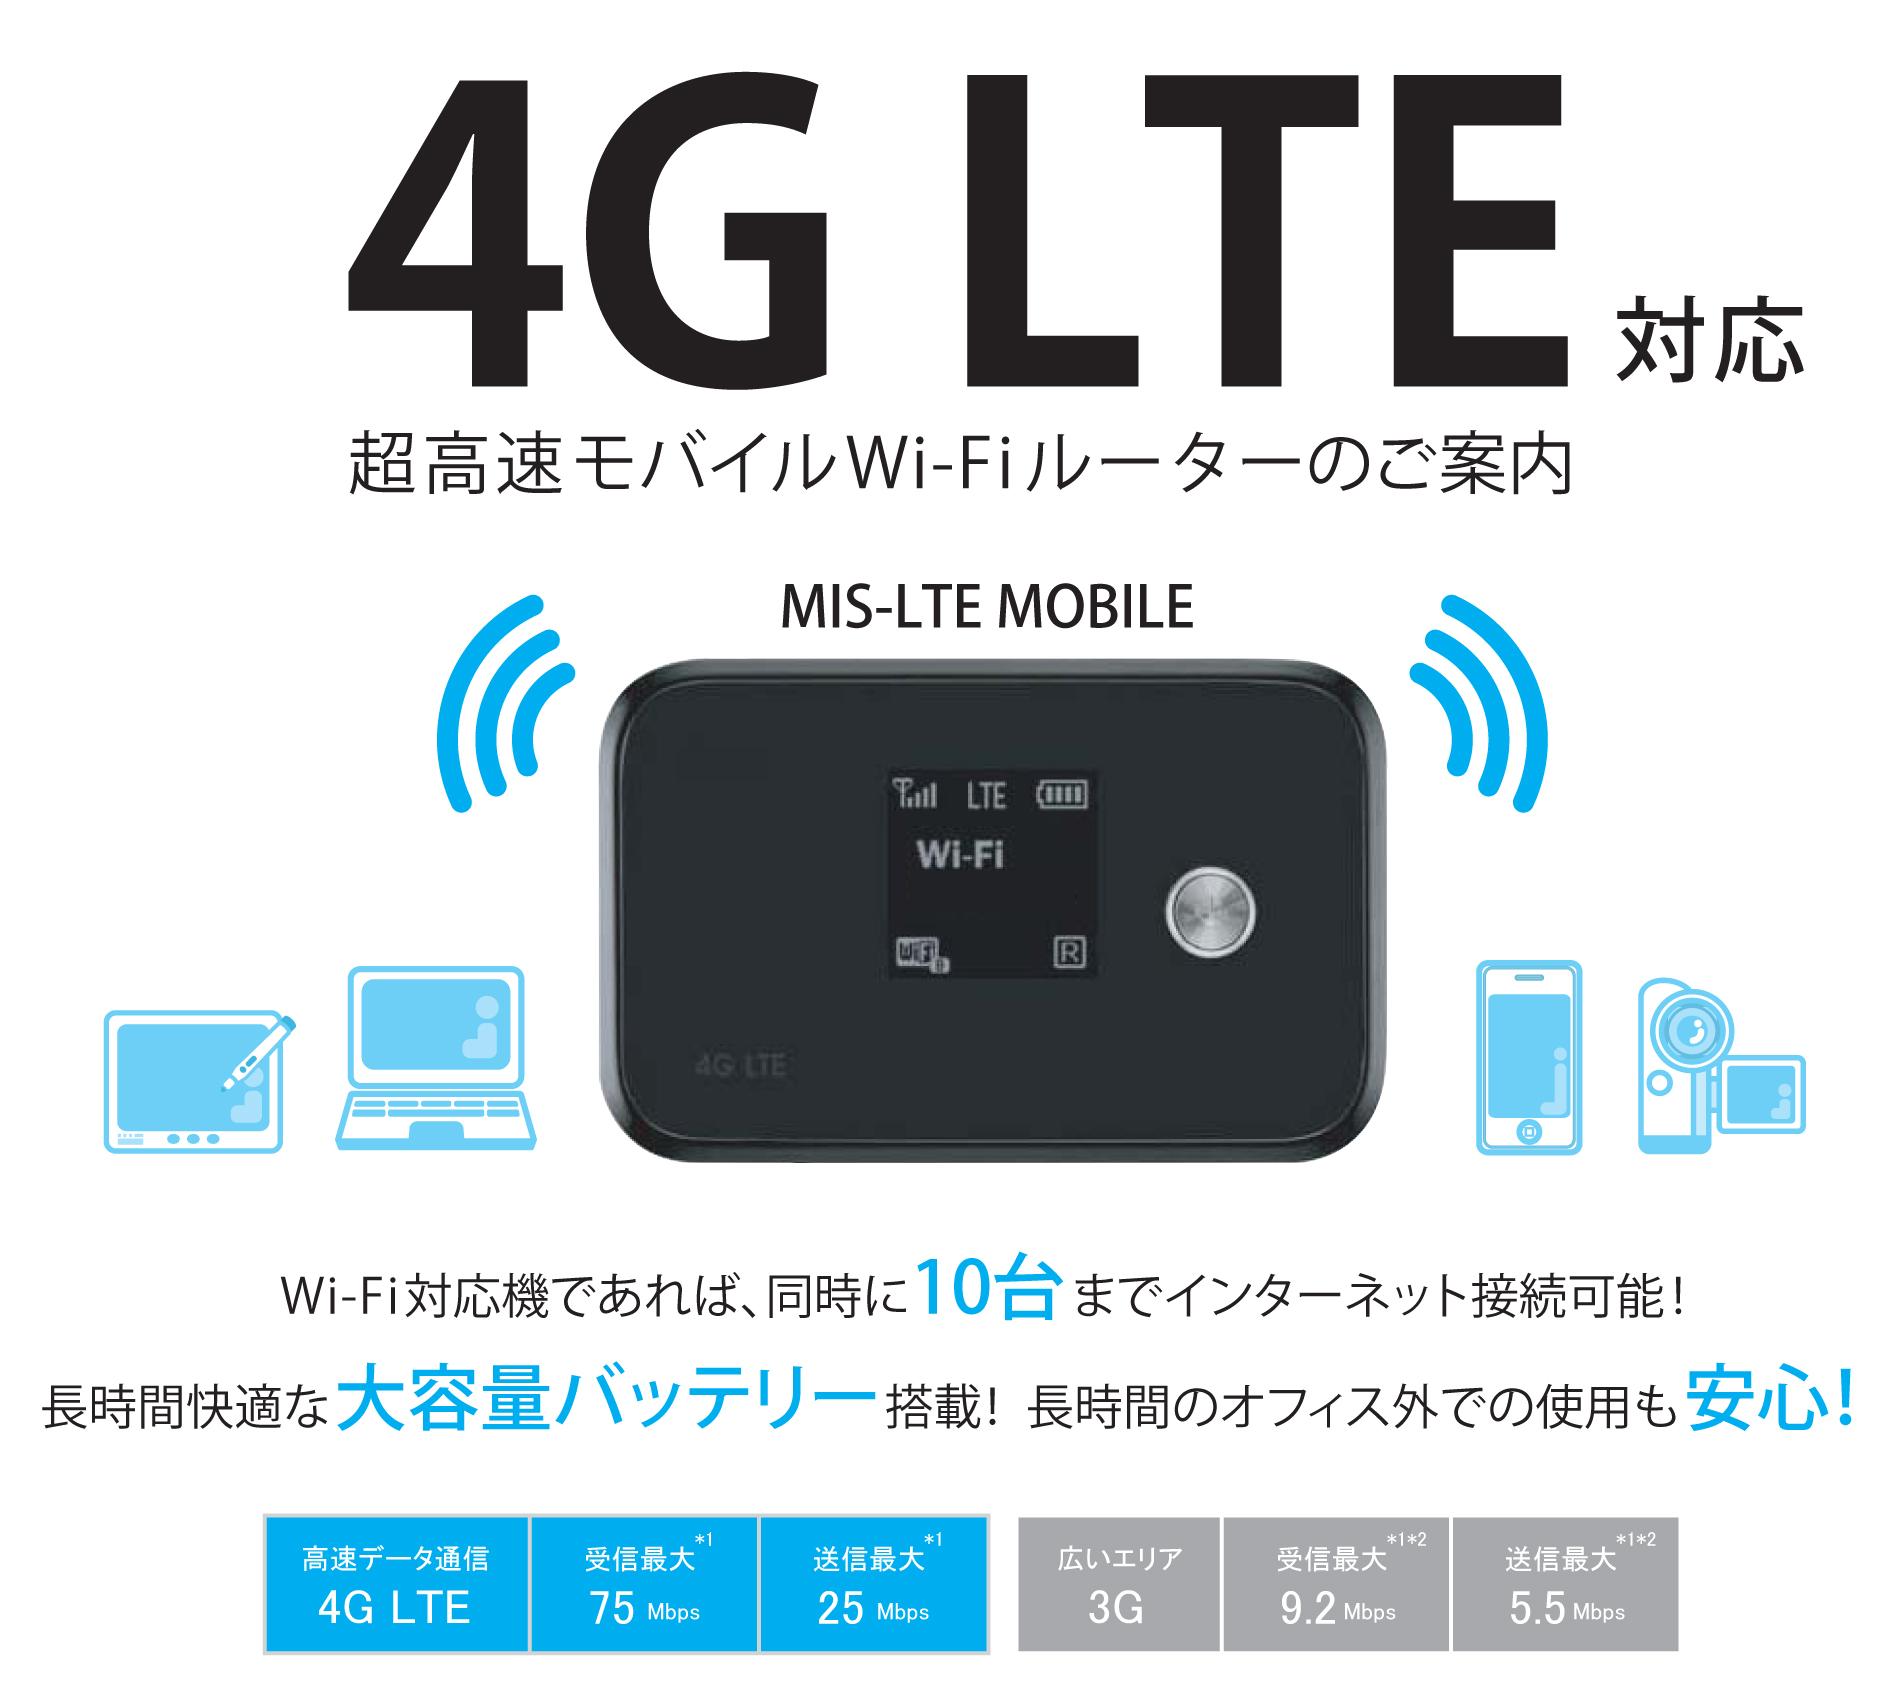 4G LTEイメージ